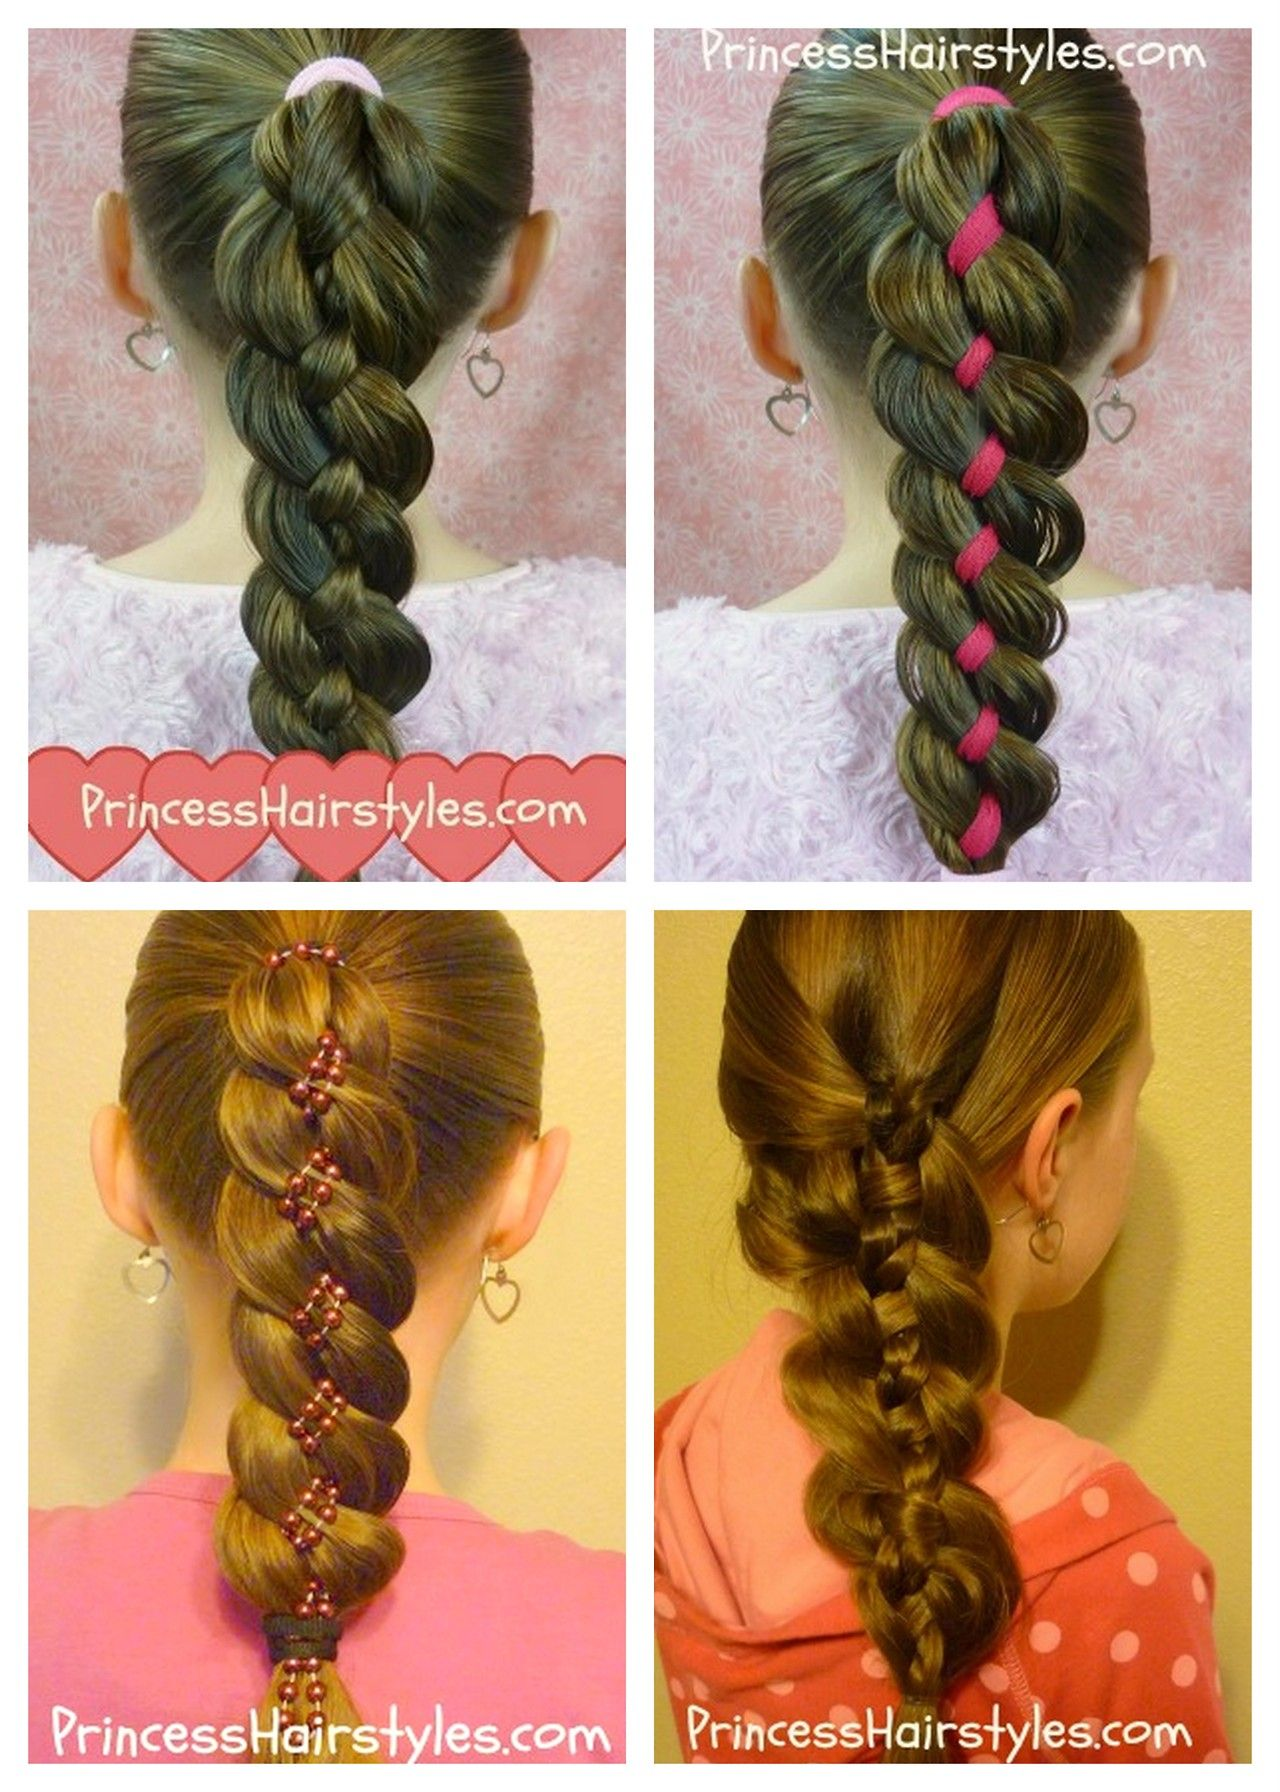 Diy strand hair braid video tutorial from princess hairstyles here